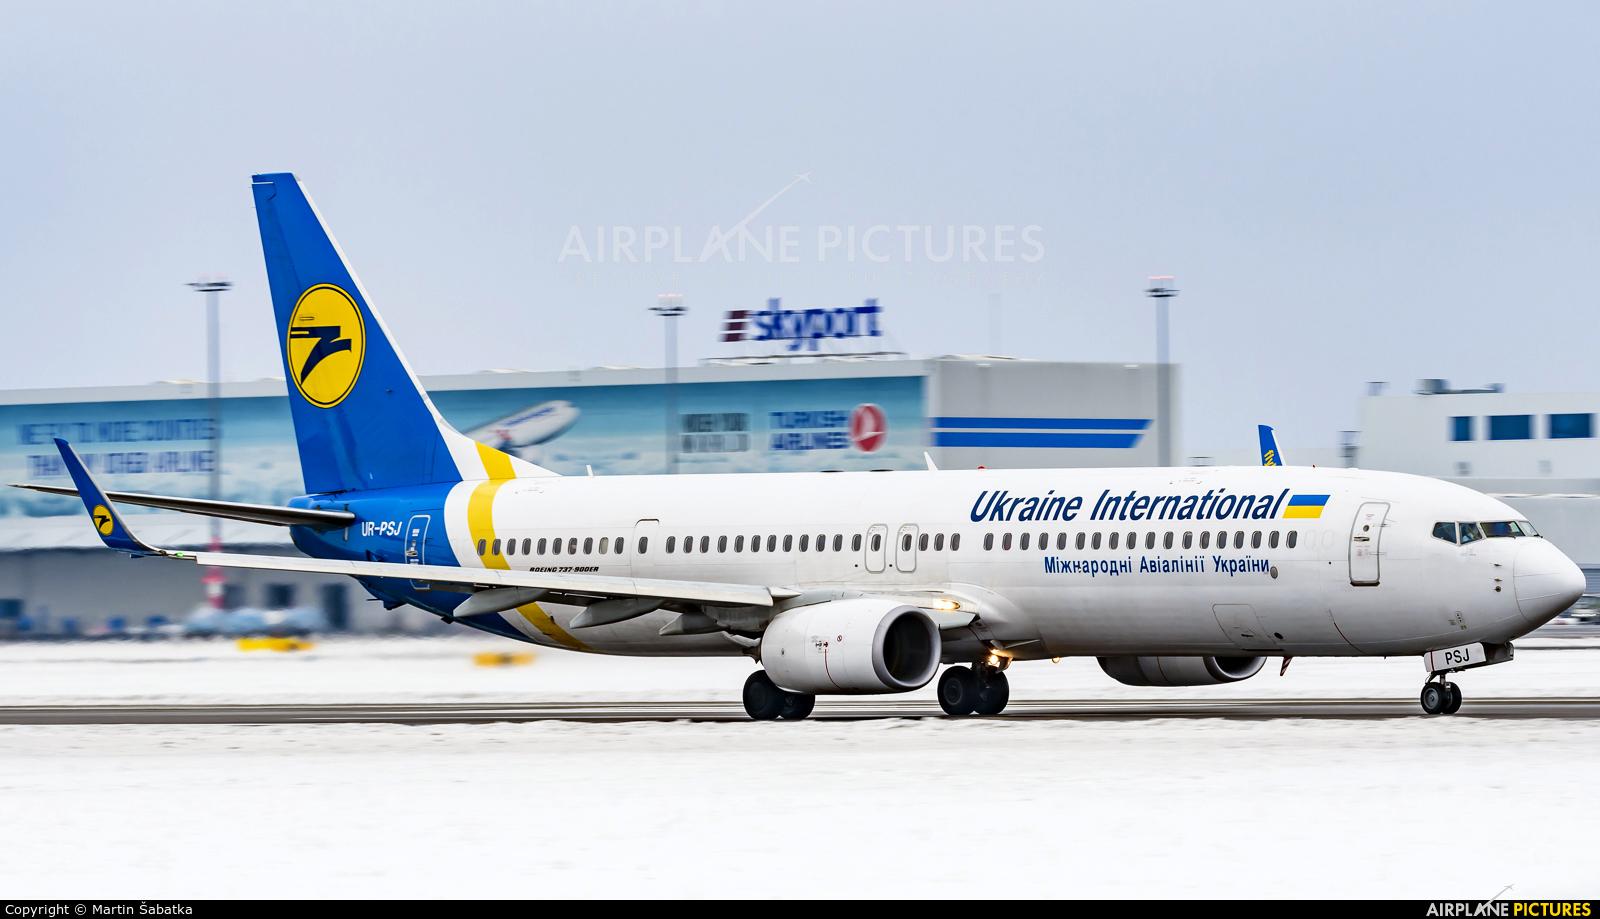 Ukraine International Airlines UR-PSJ aircraft at Prague - Václav Havel